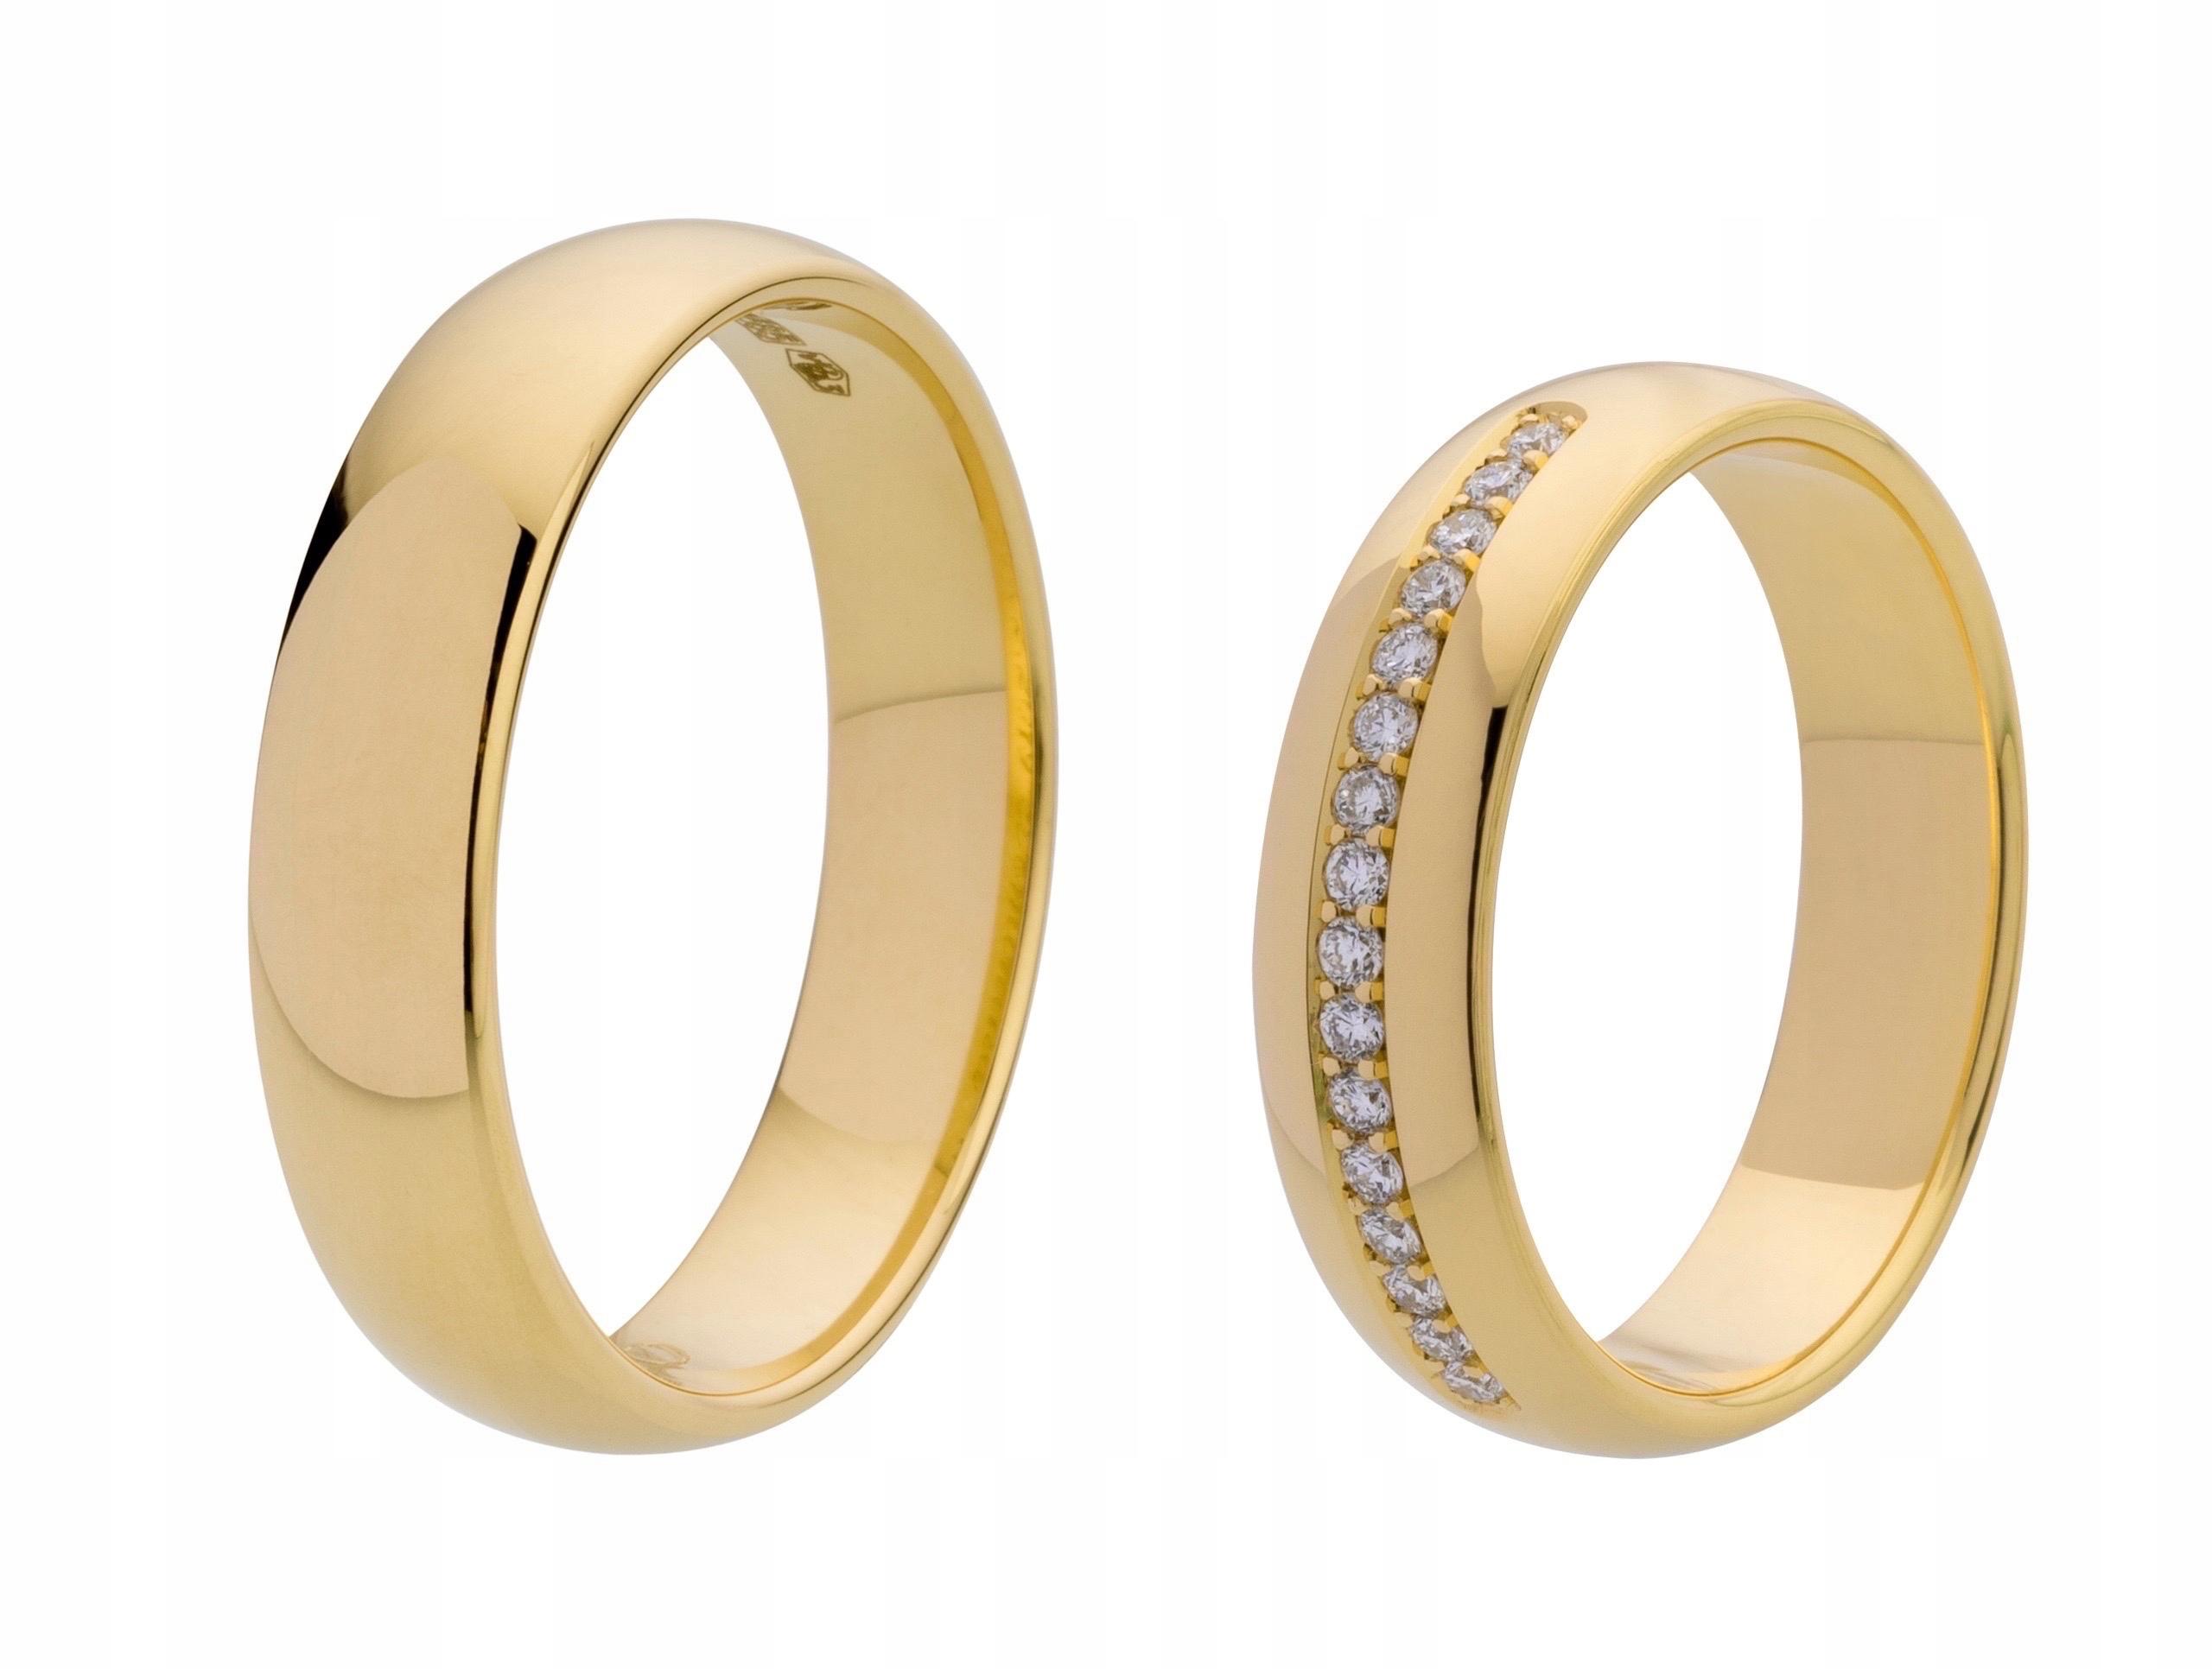 Item GOLD 585 wedding RING with 16 DIAMONDS 0.16 ct